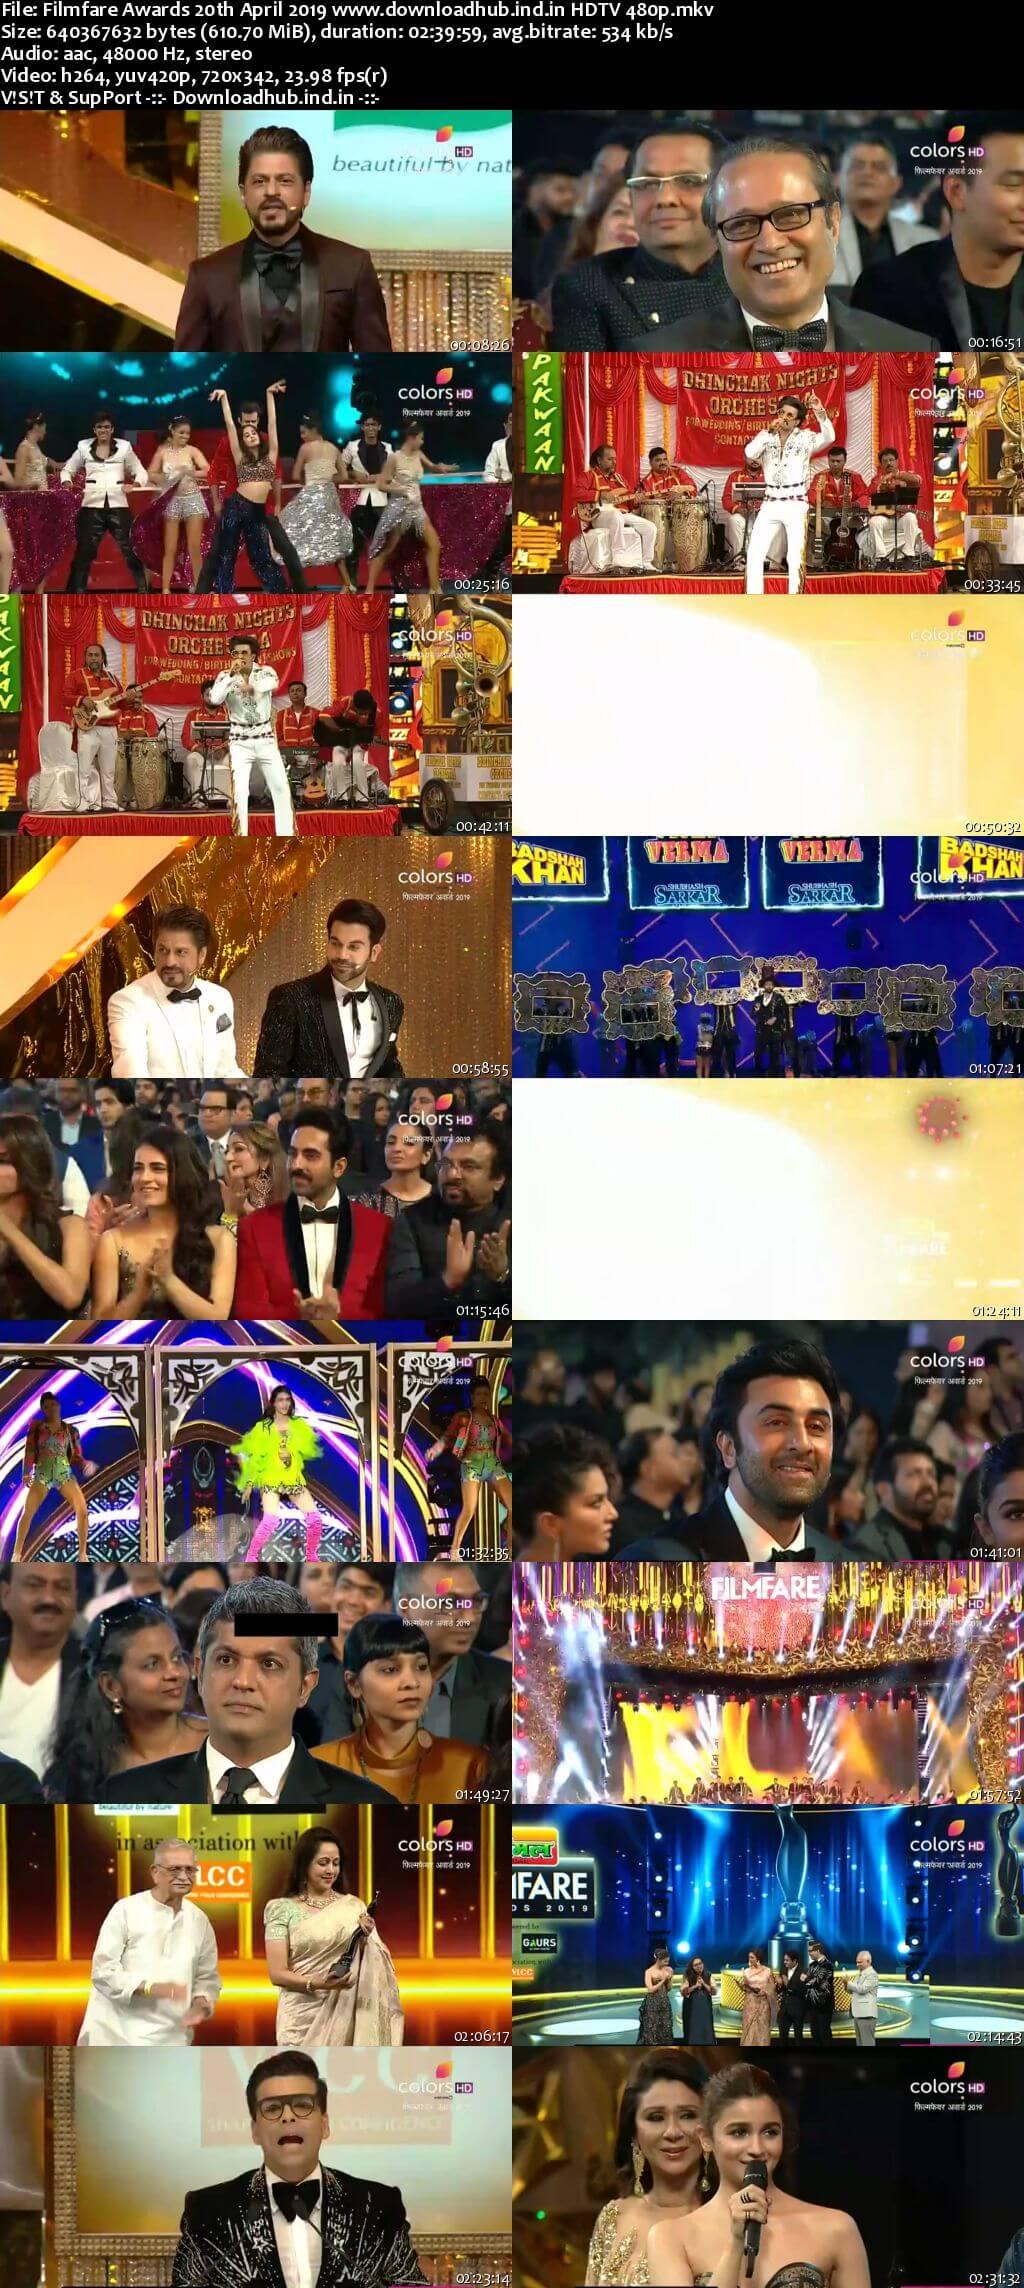 Filmfare Awards 20th April 2019 600MB HDTV 480p